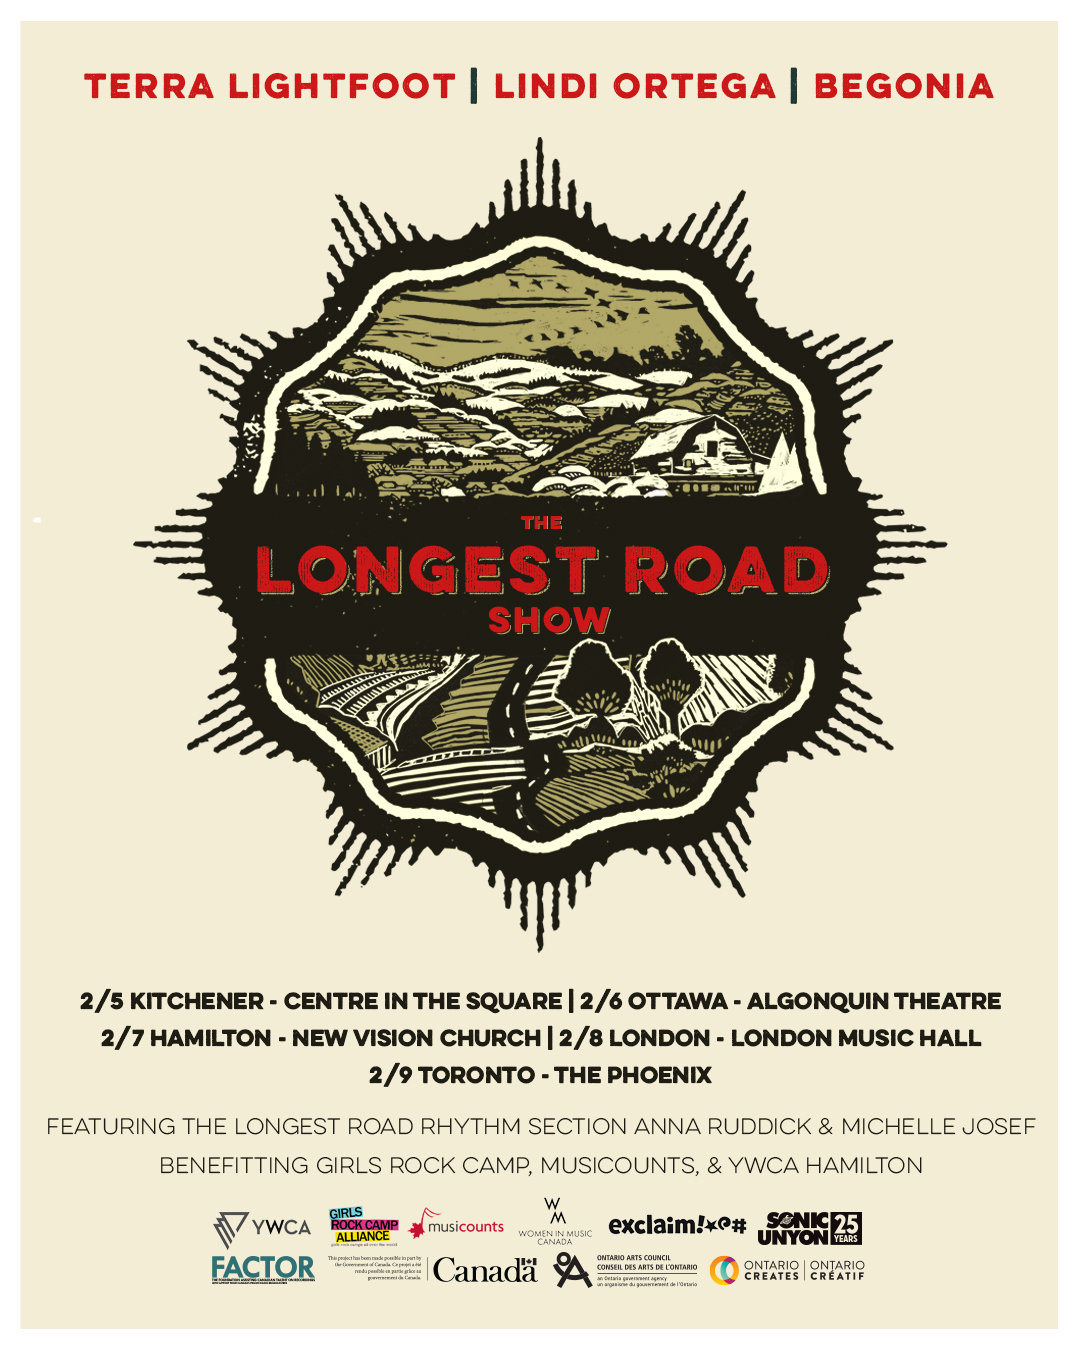 The Longest Road Socials 1080x1350px.jpg